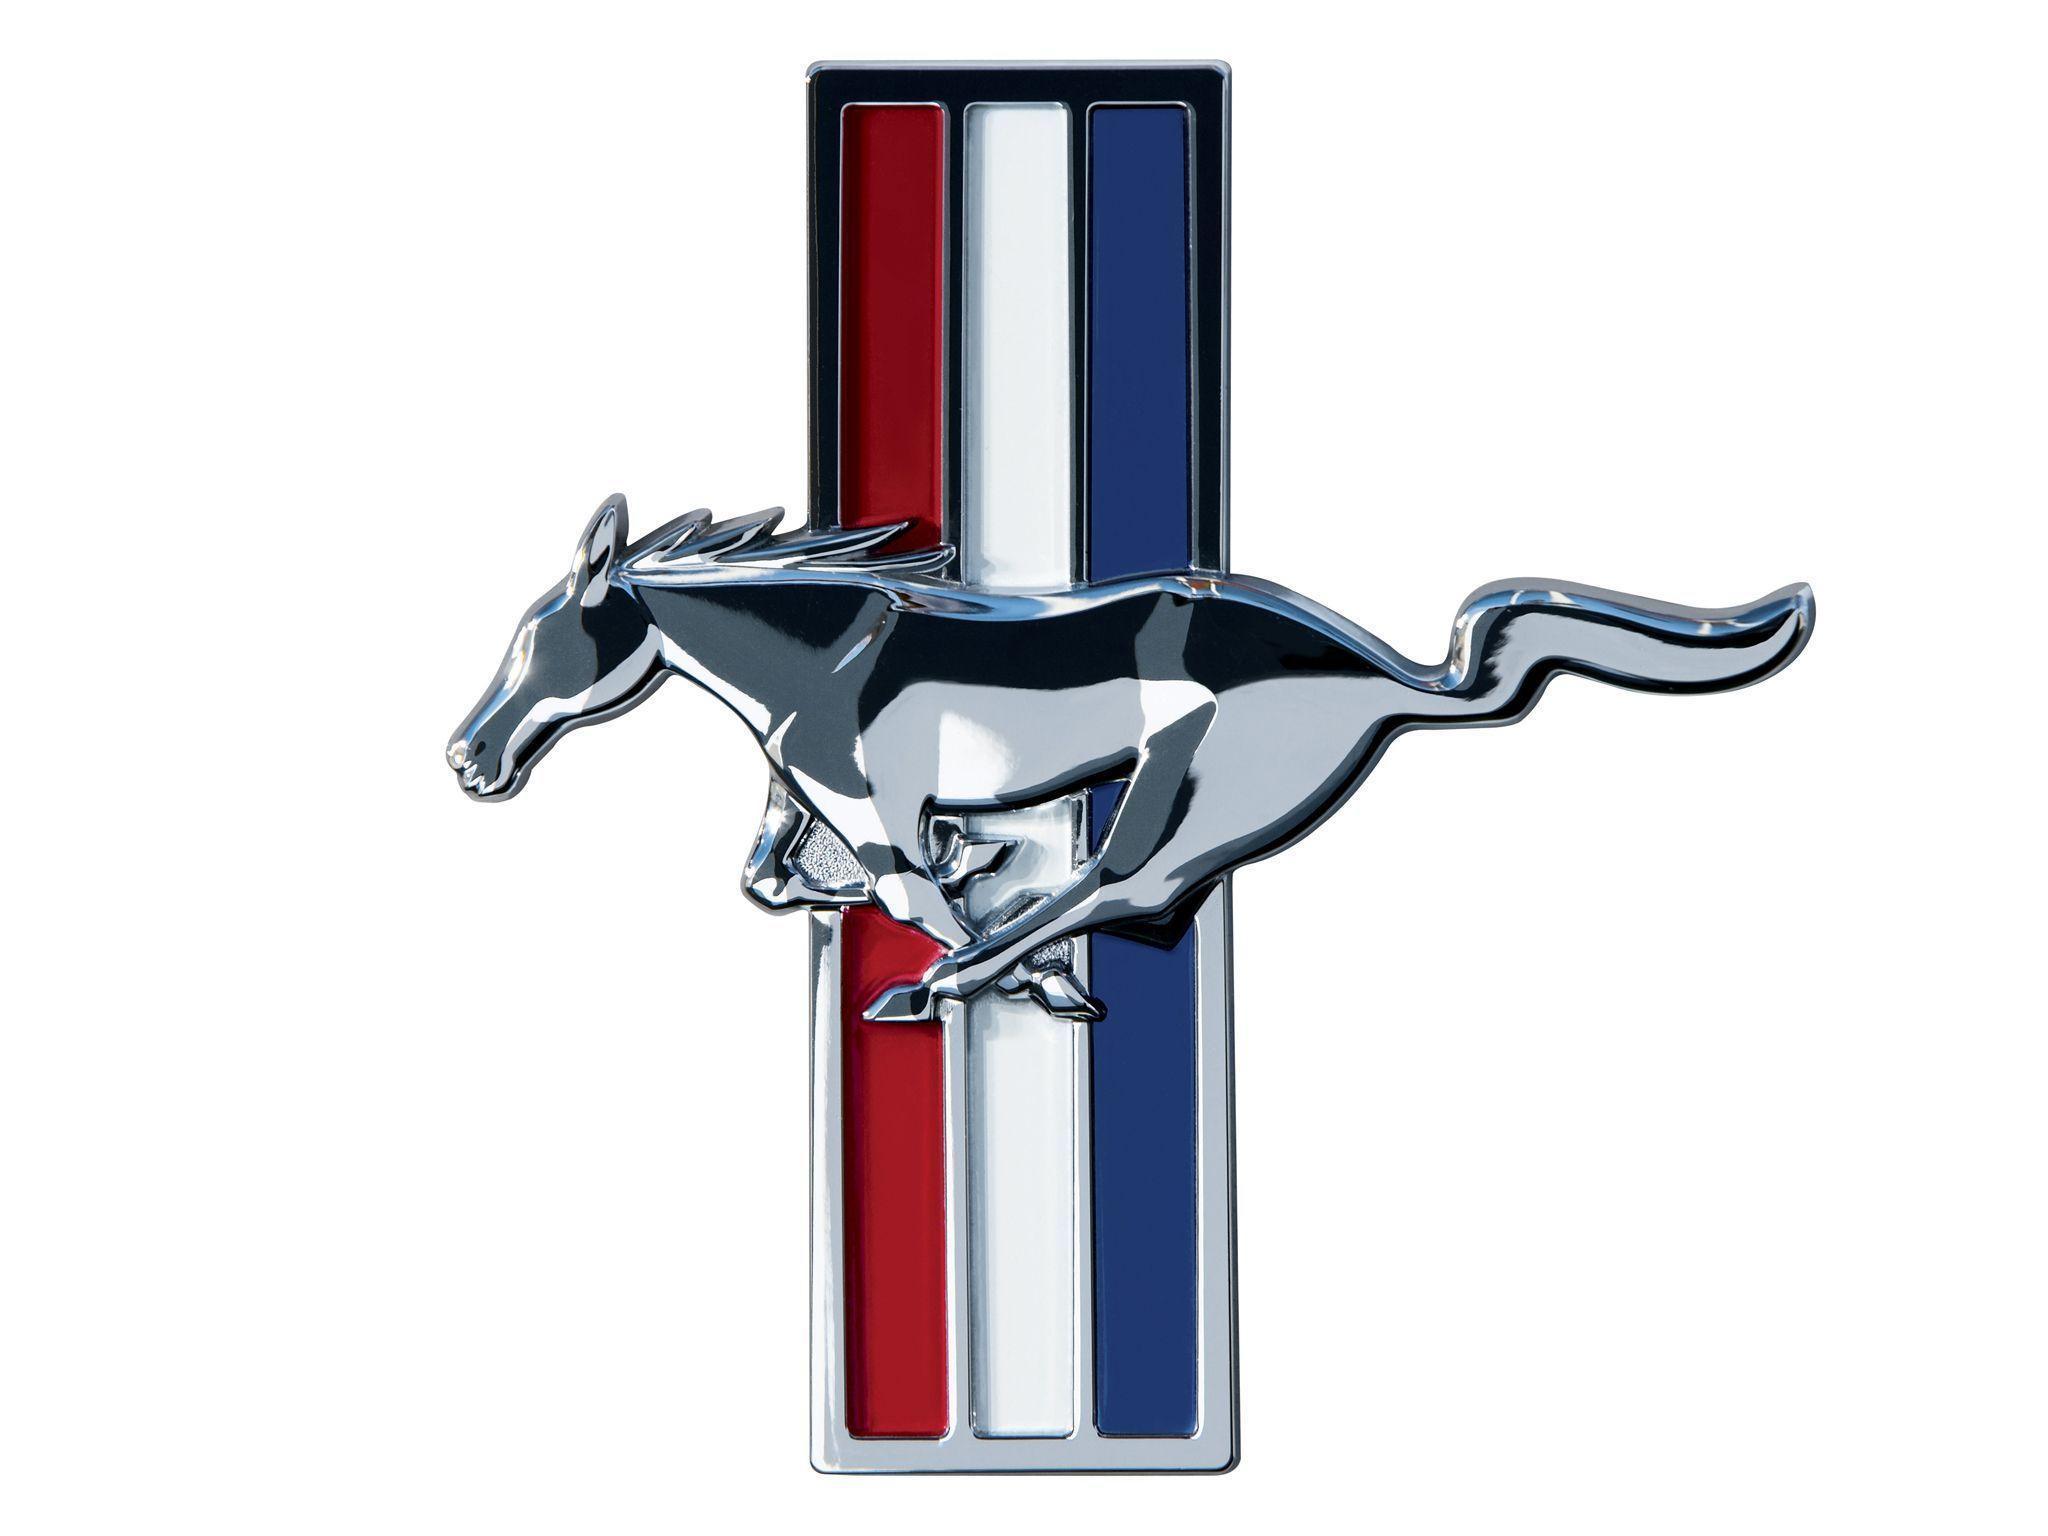 Mustang emblem wallpaper - photo#6